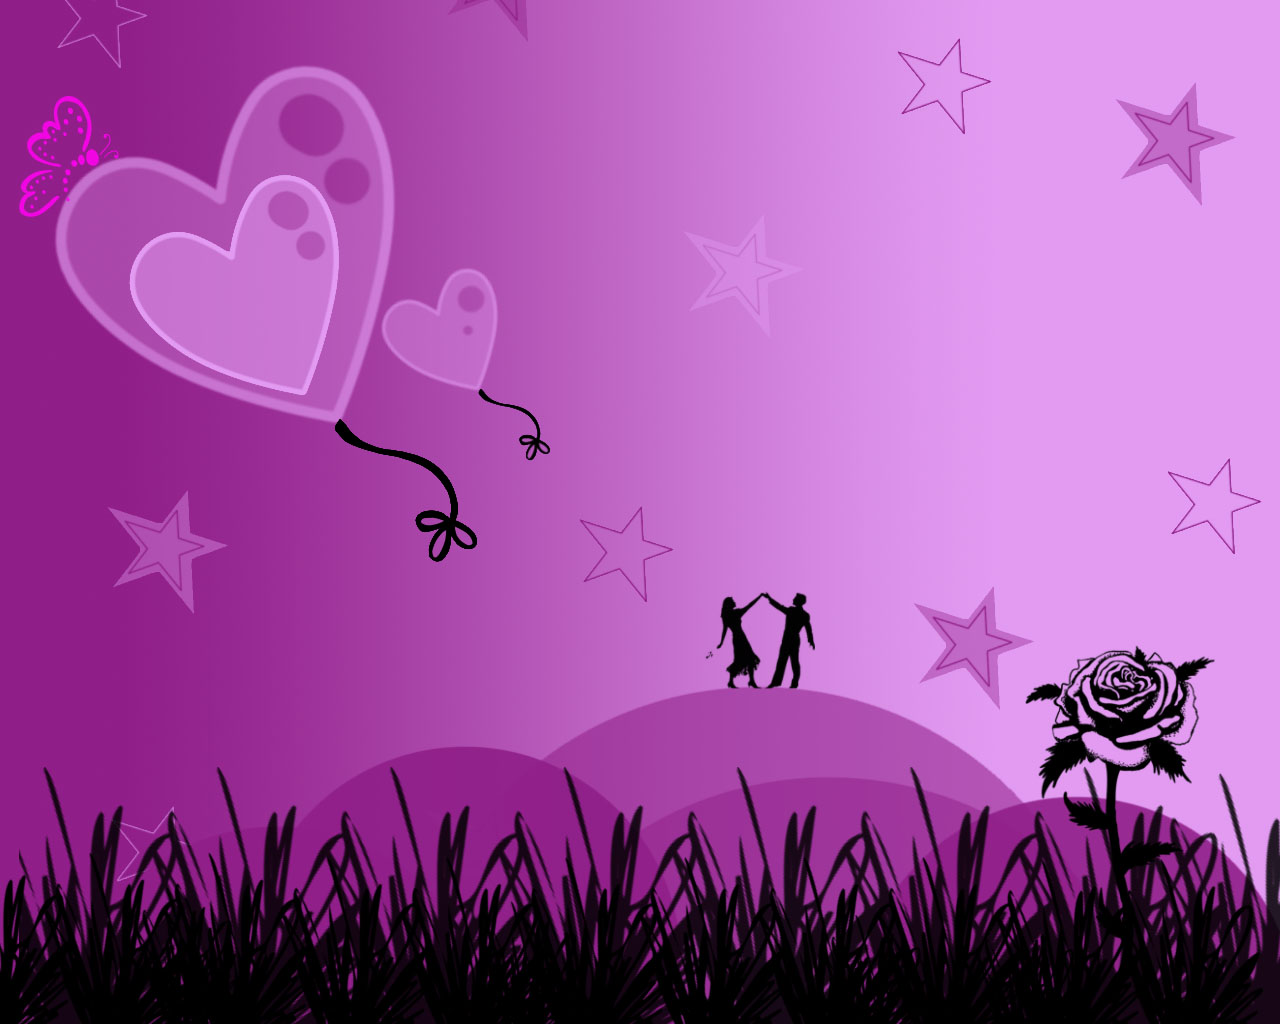 purple wallpaper free photos: Purple Love Wallpaper